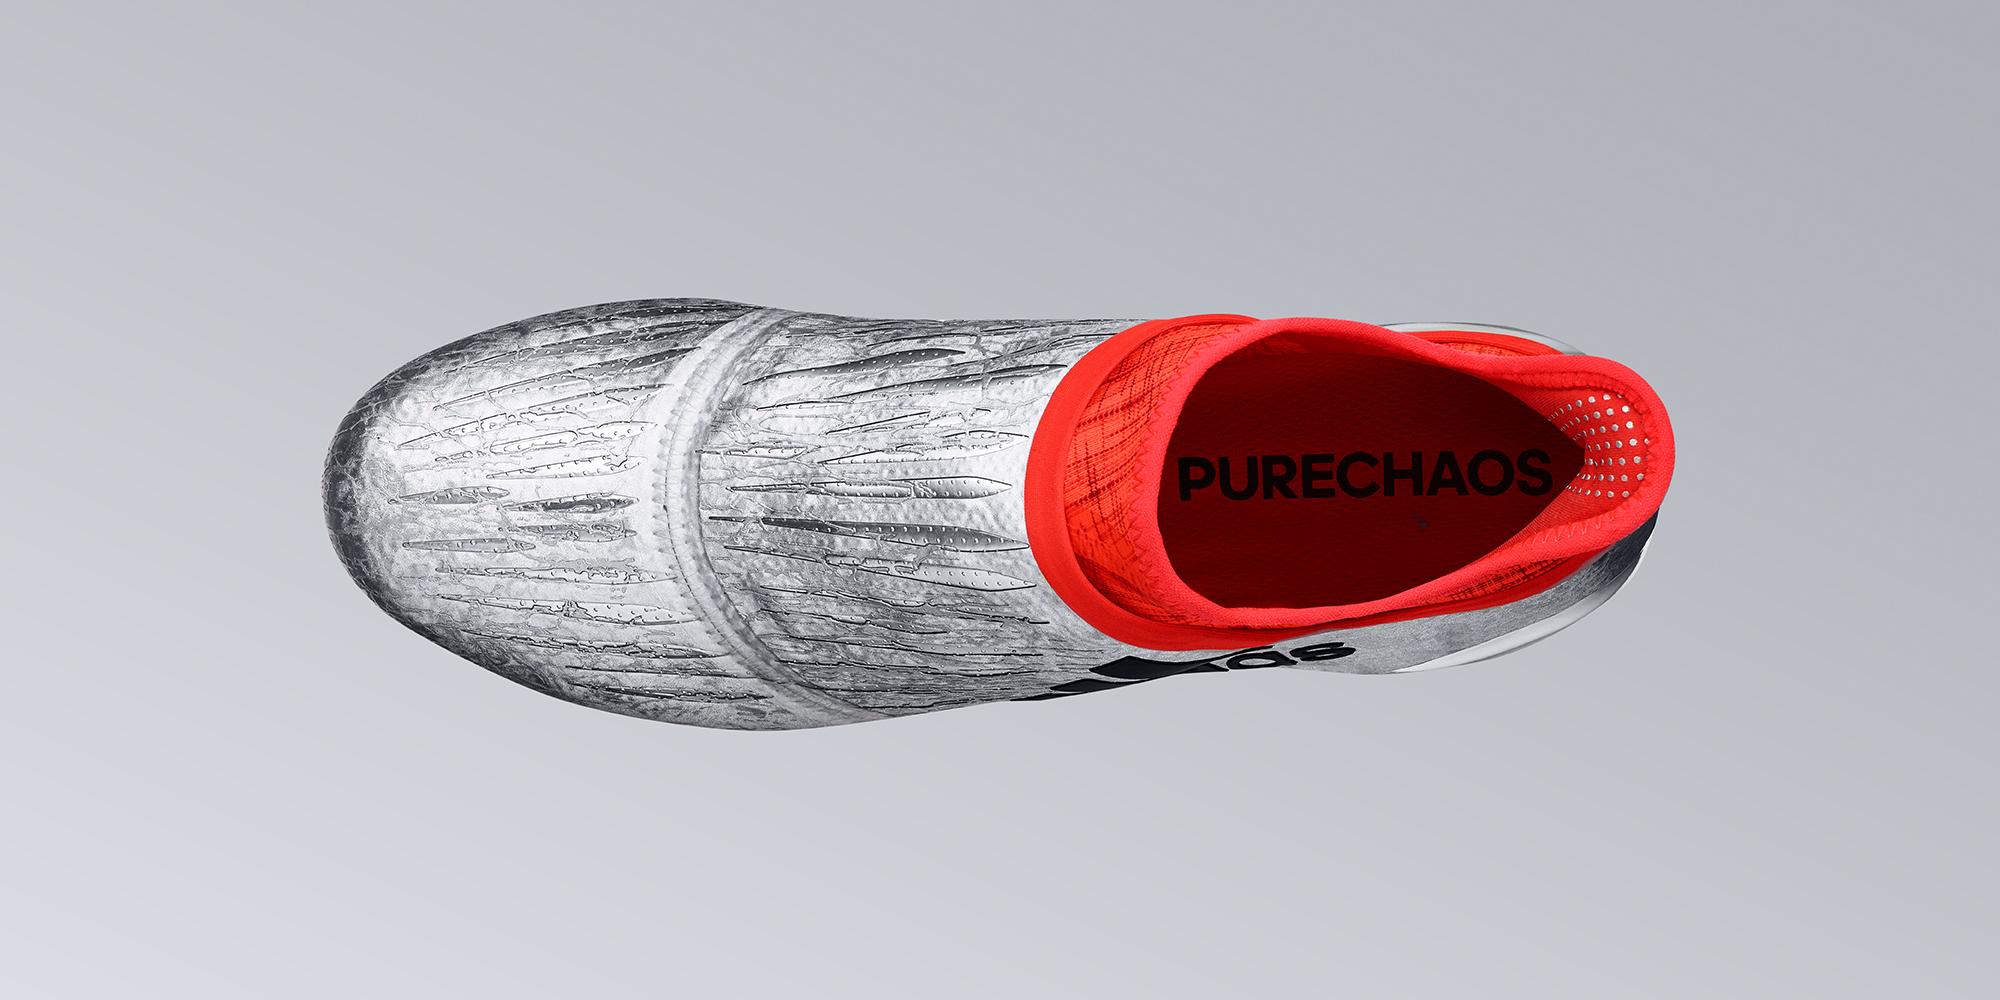 X16+ PURECHAOS euro 2016 adidas mercury pack